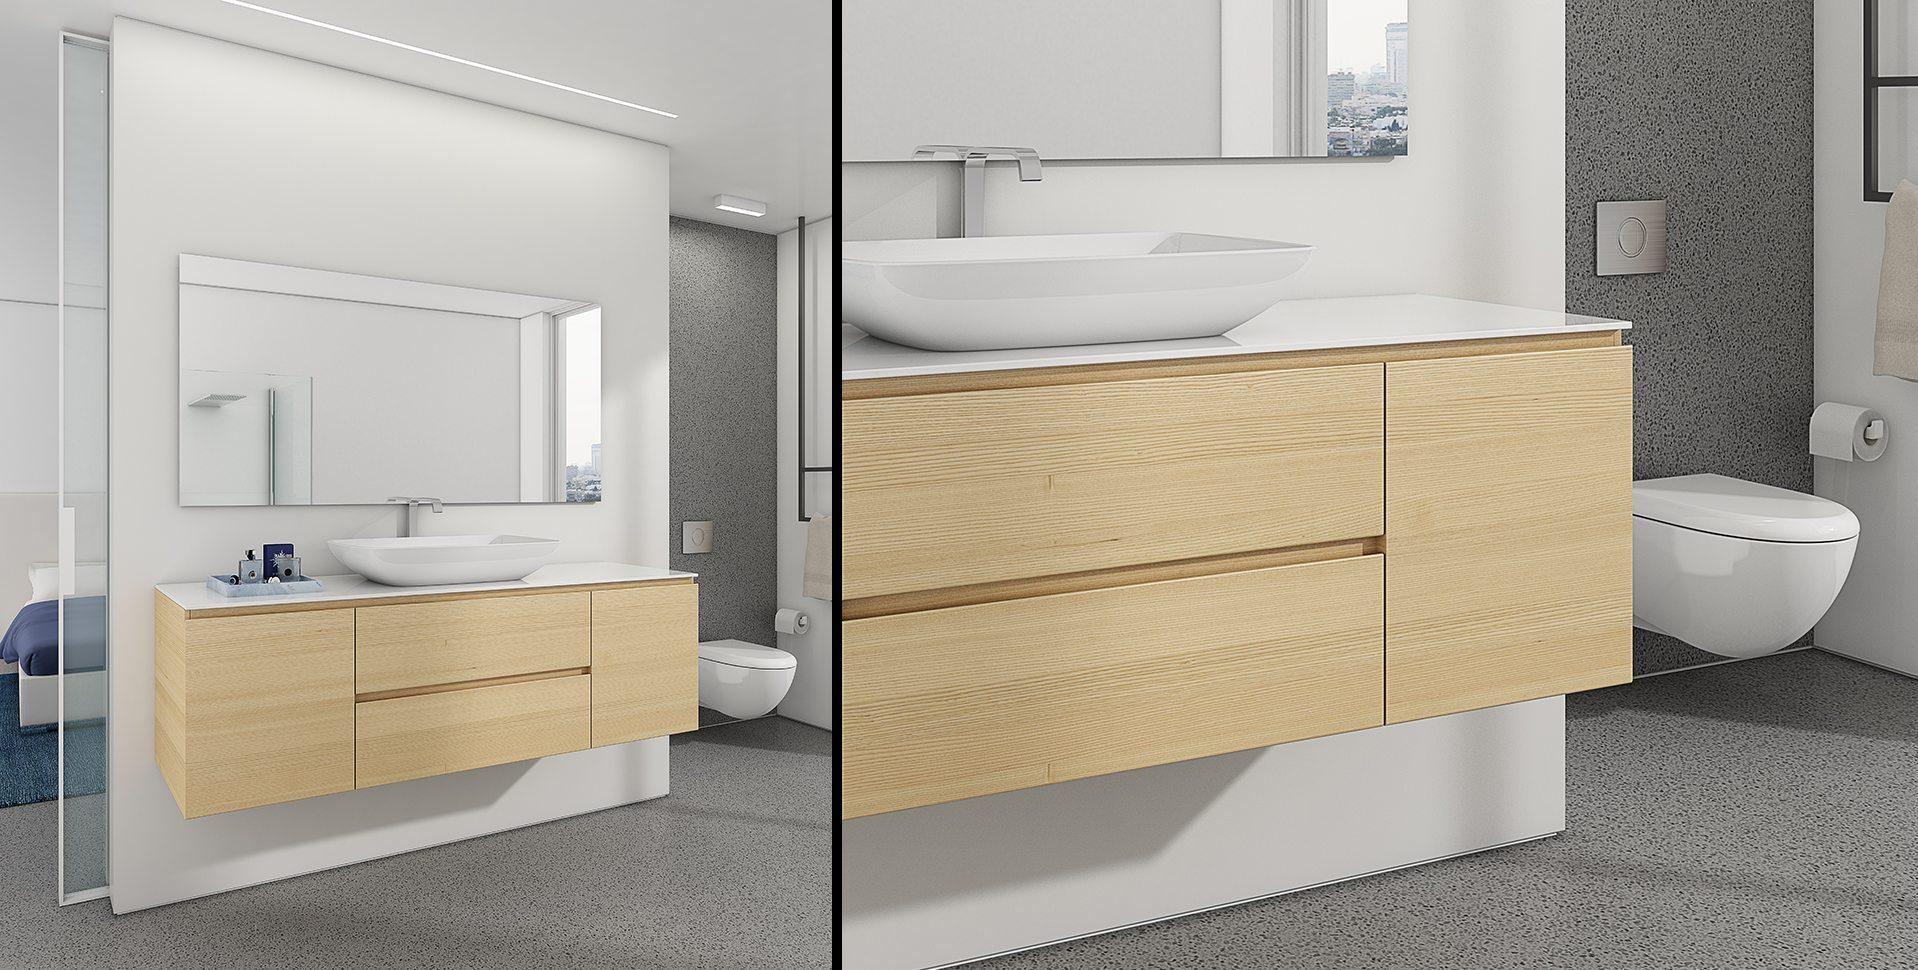 Product Visualization: Bathroom Cabinets by El-Gal, Modern Bathroom interior Design